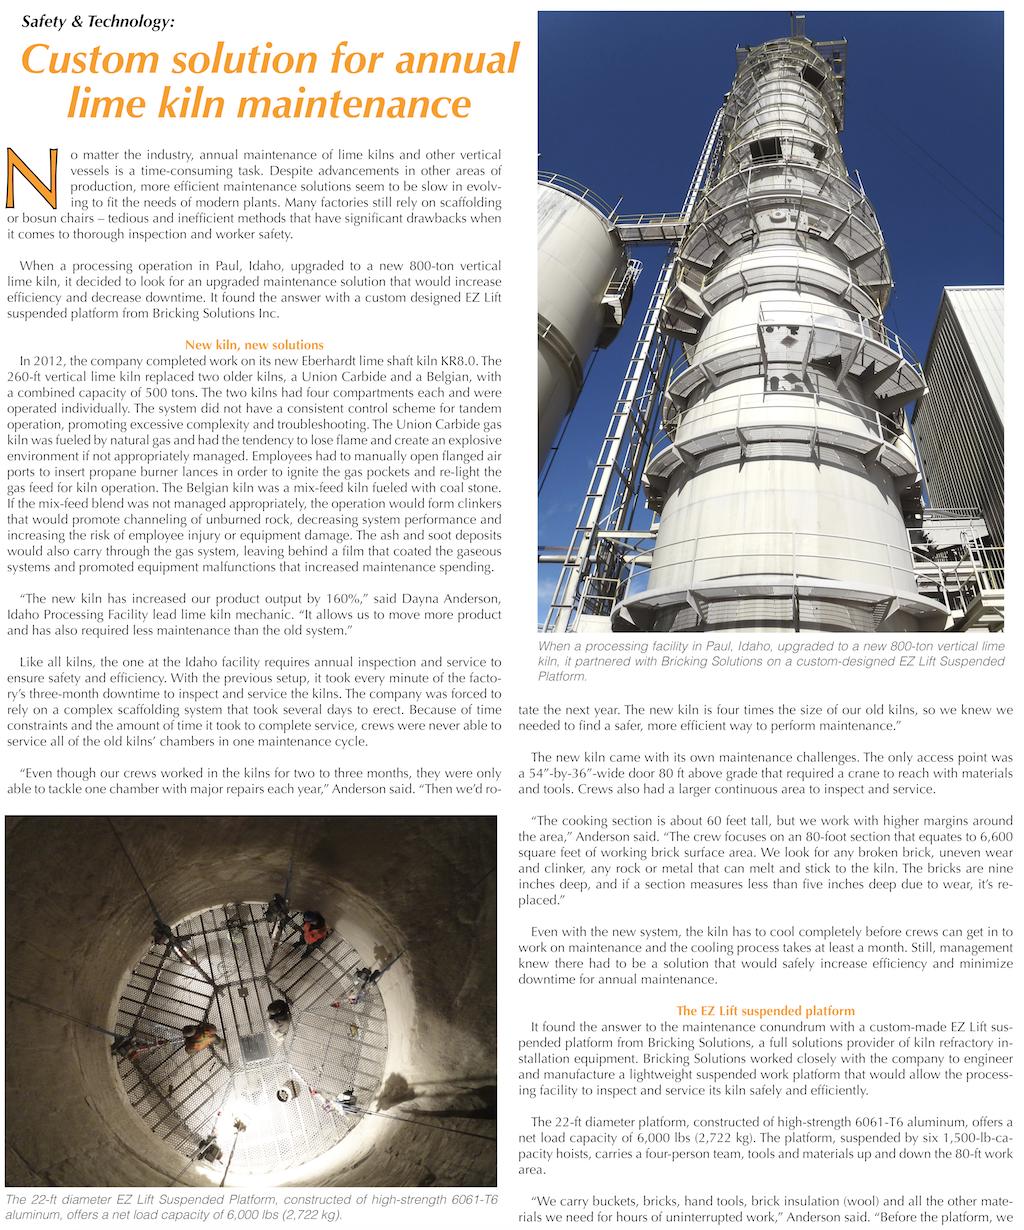 Custom solution for annual lime kiln maintenance